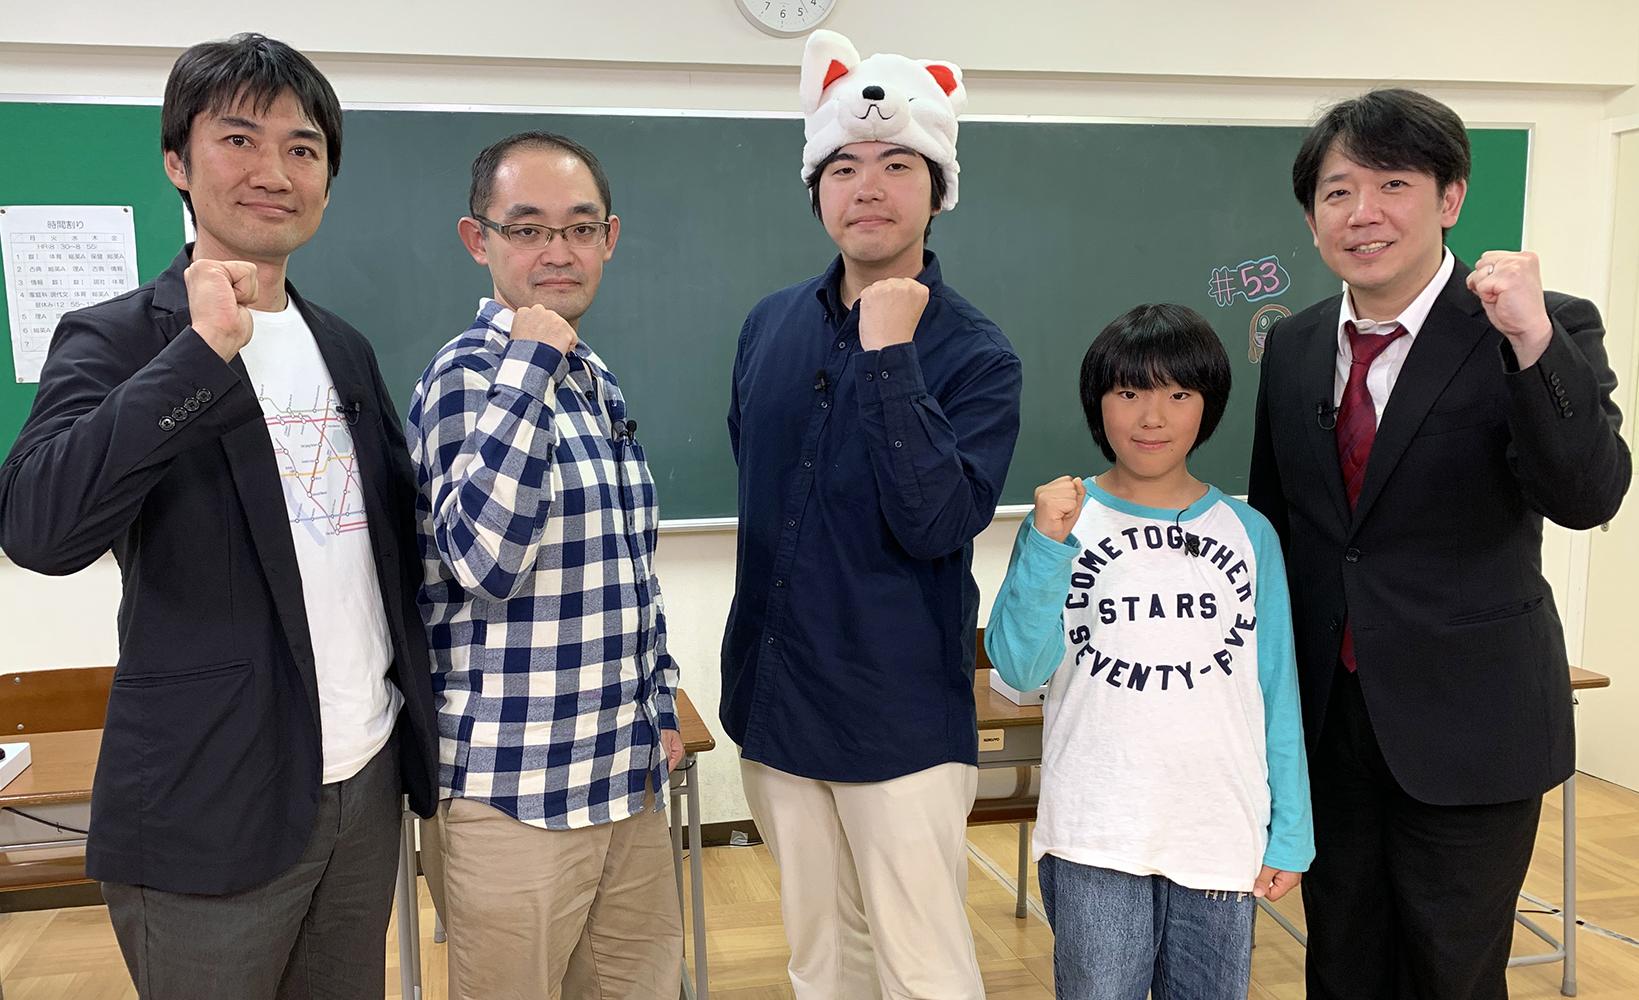 QUIZ JAPAN TVのオリジナルクイズ番組「魁!!クイズ塾」第53回は「99人の壁グランドスラマー大会」!